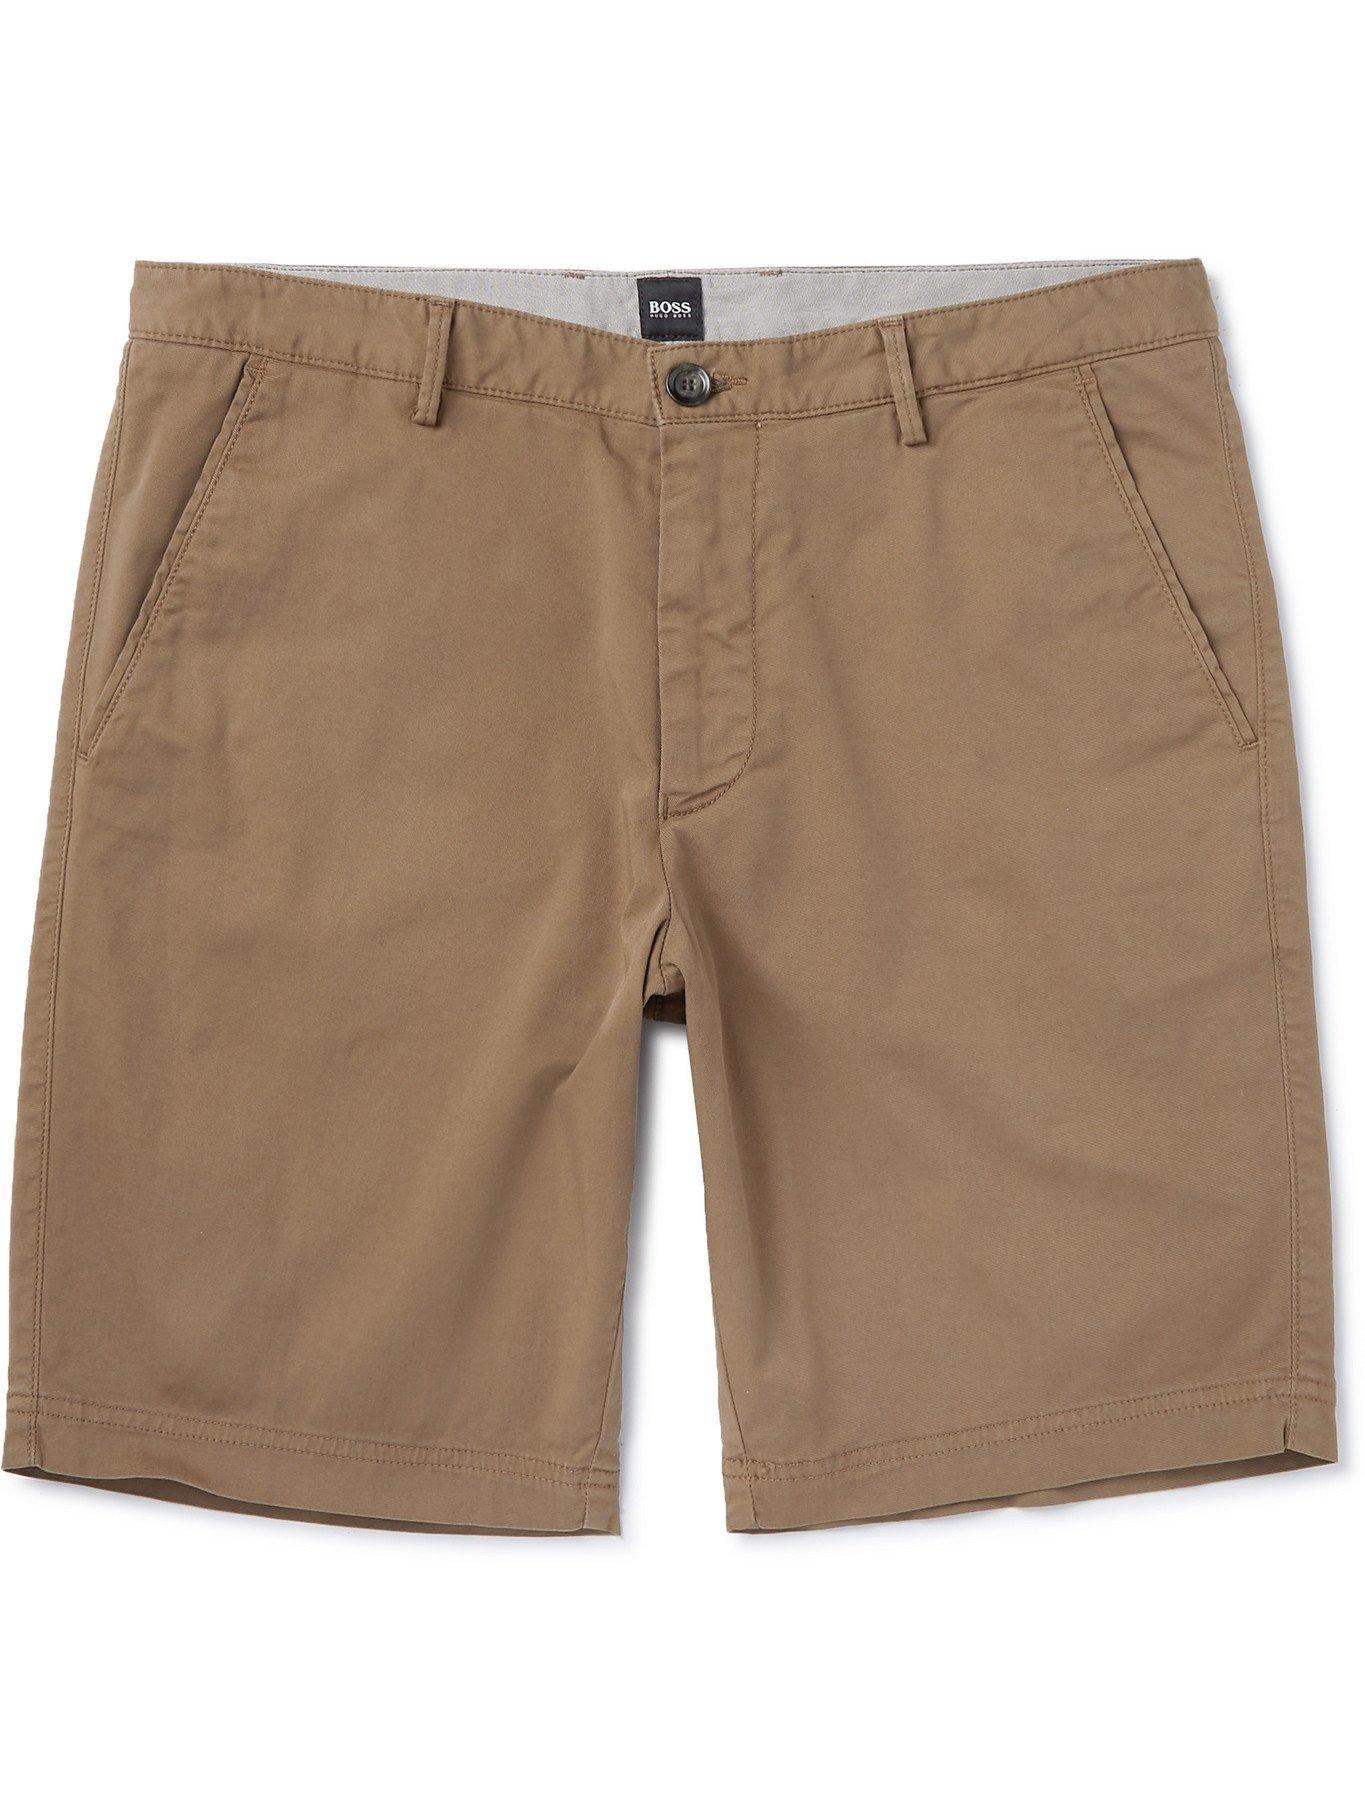 HUGO BOSS - Stretch-Cotton Twill Shorts - Neutrals - UK/US 30